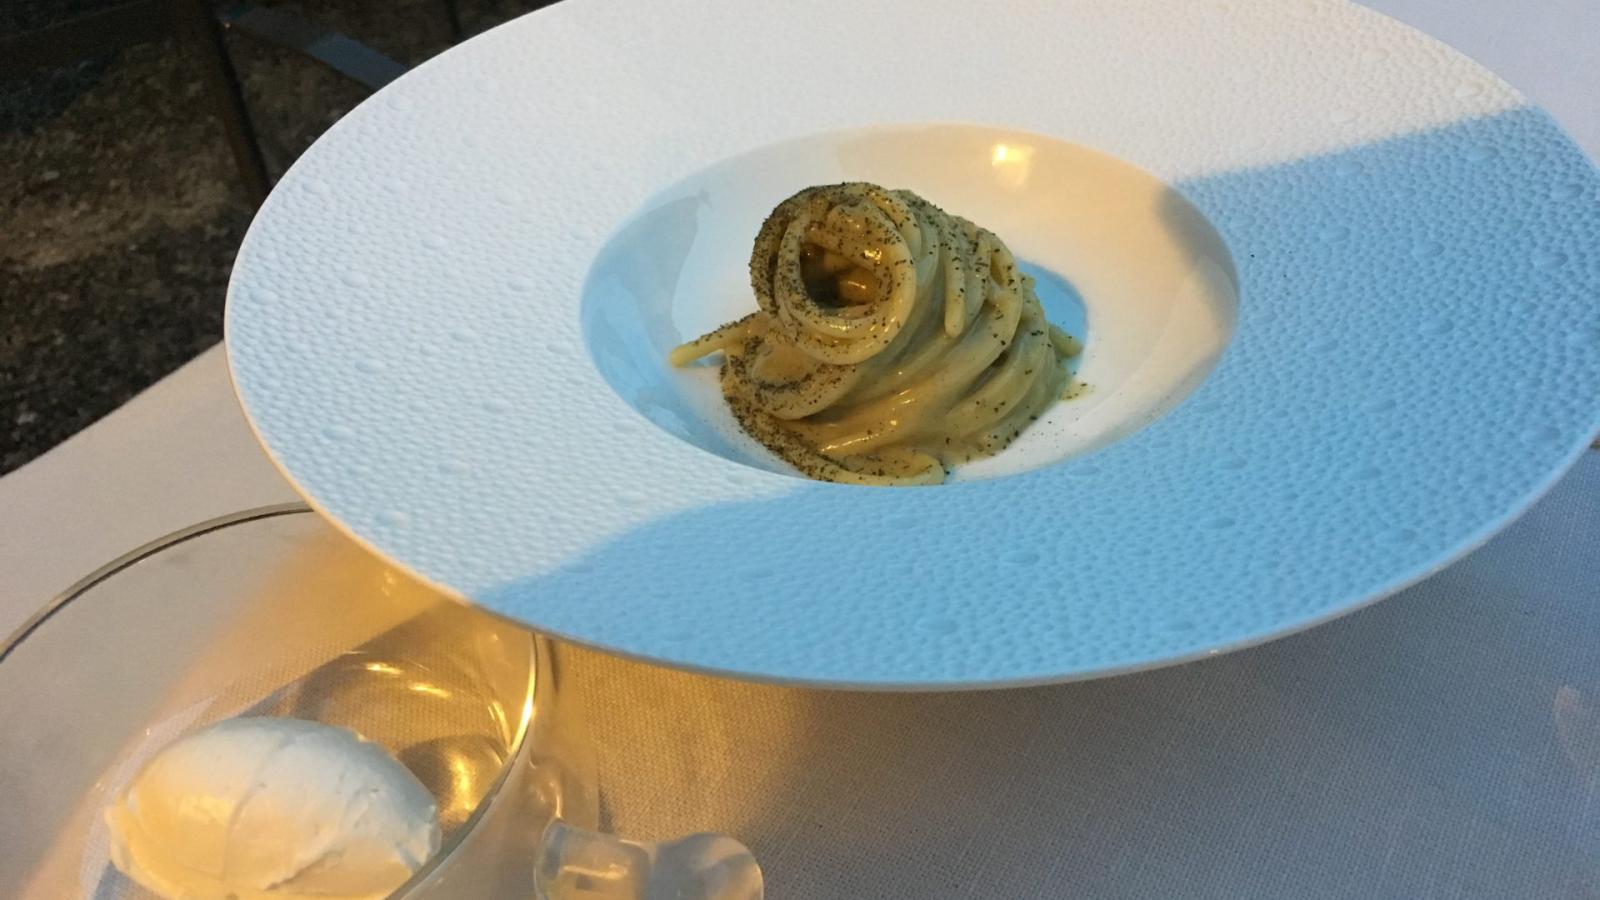 Spaghetto Burro e salvia di Sakalis al Pievano-min